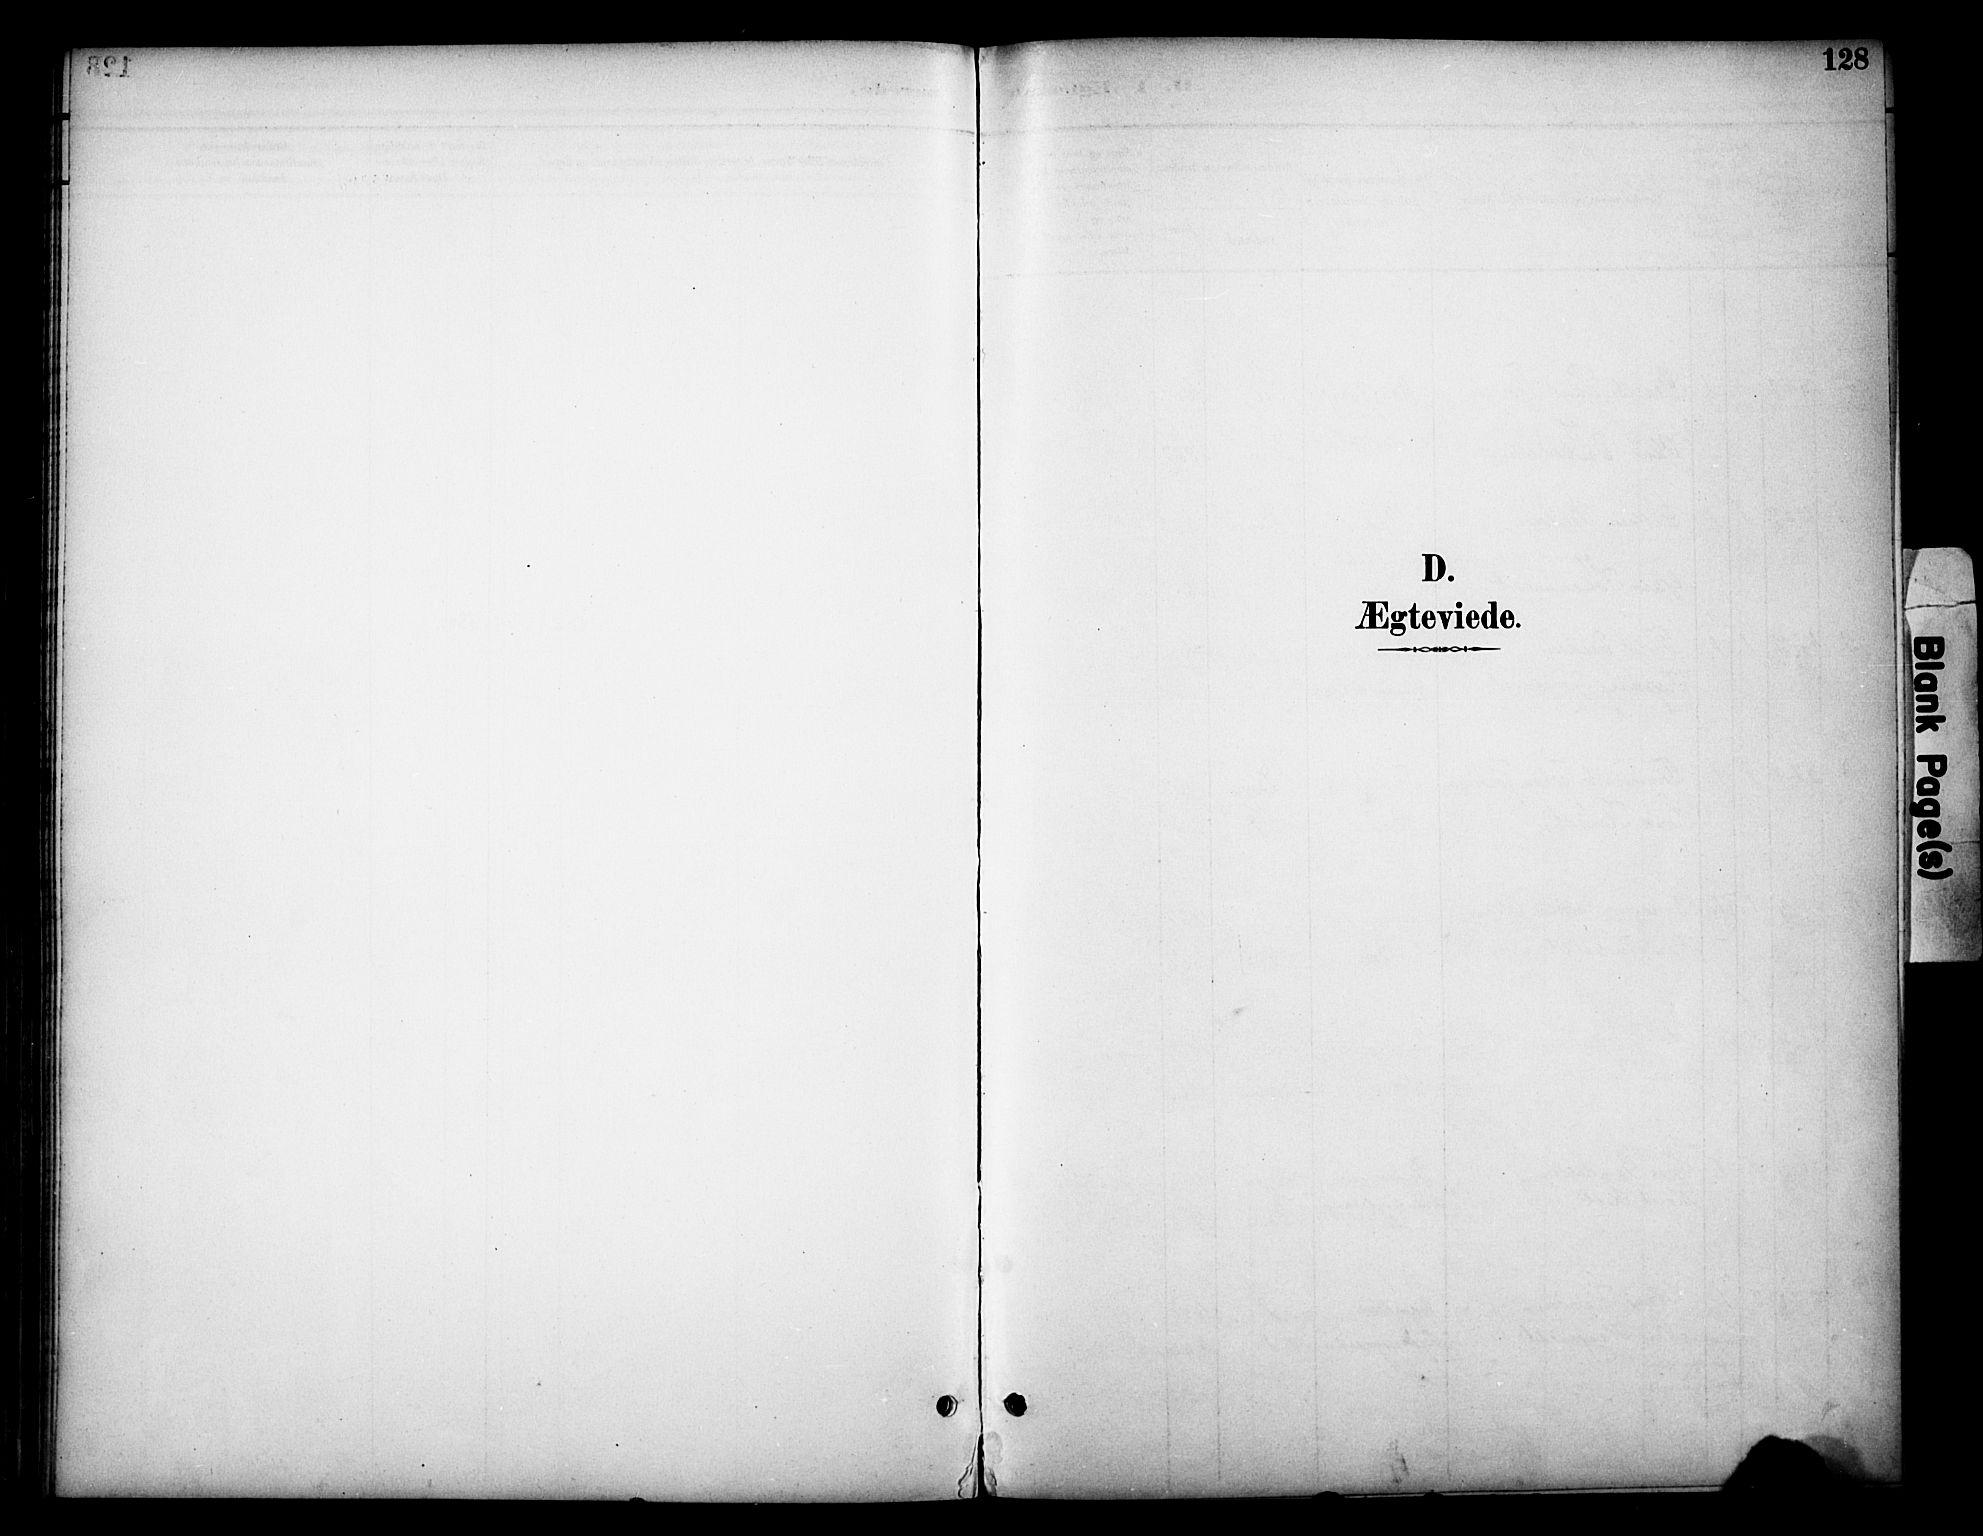 SAH, Dovre prestekontor, Ministerialbok nr. 3, 1891-1901, s. 128